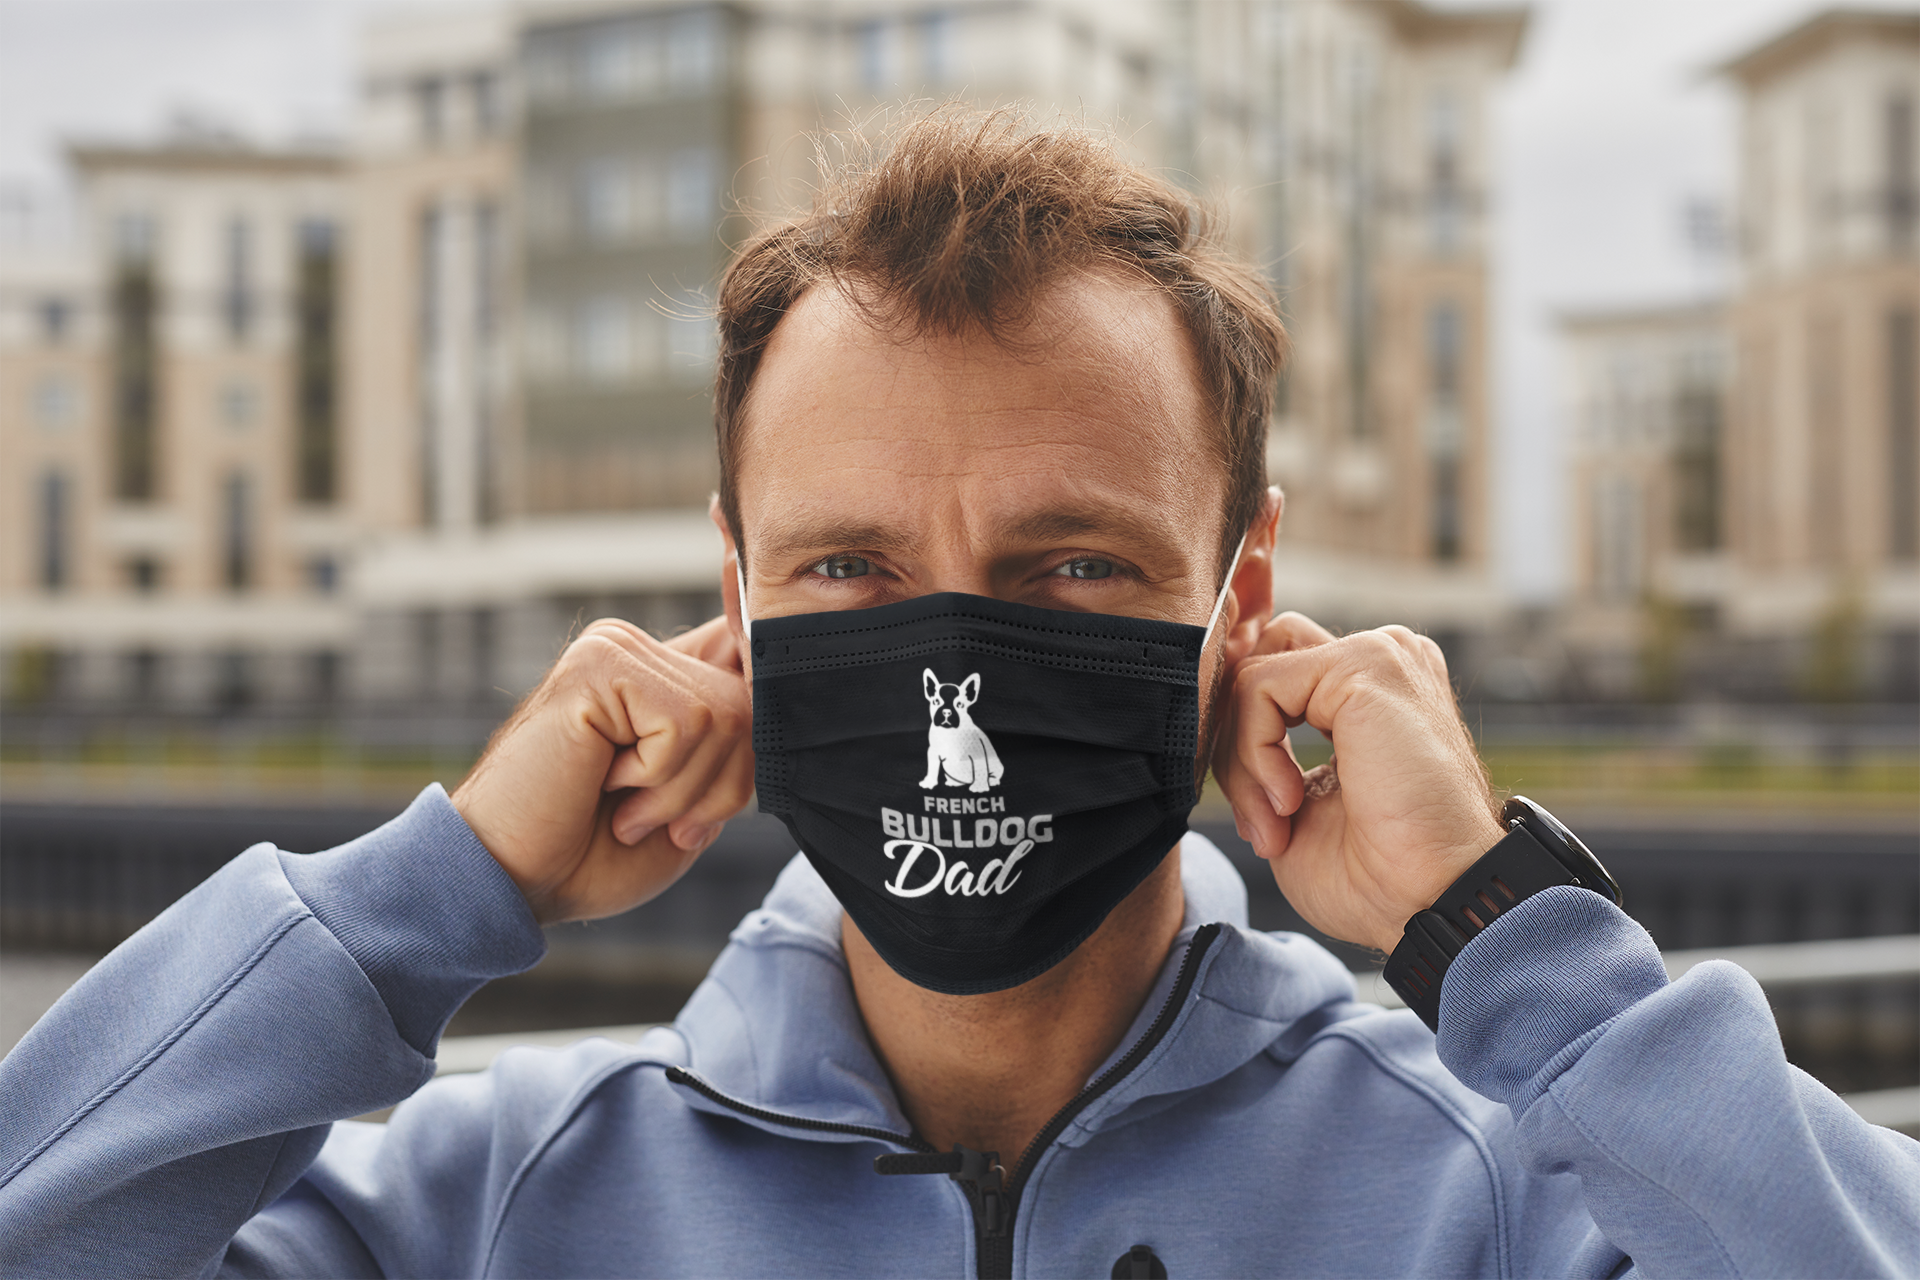 French Bulldog Face Mask - Statements Clothing